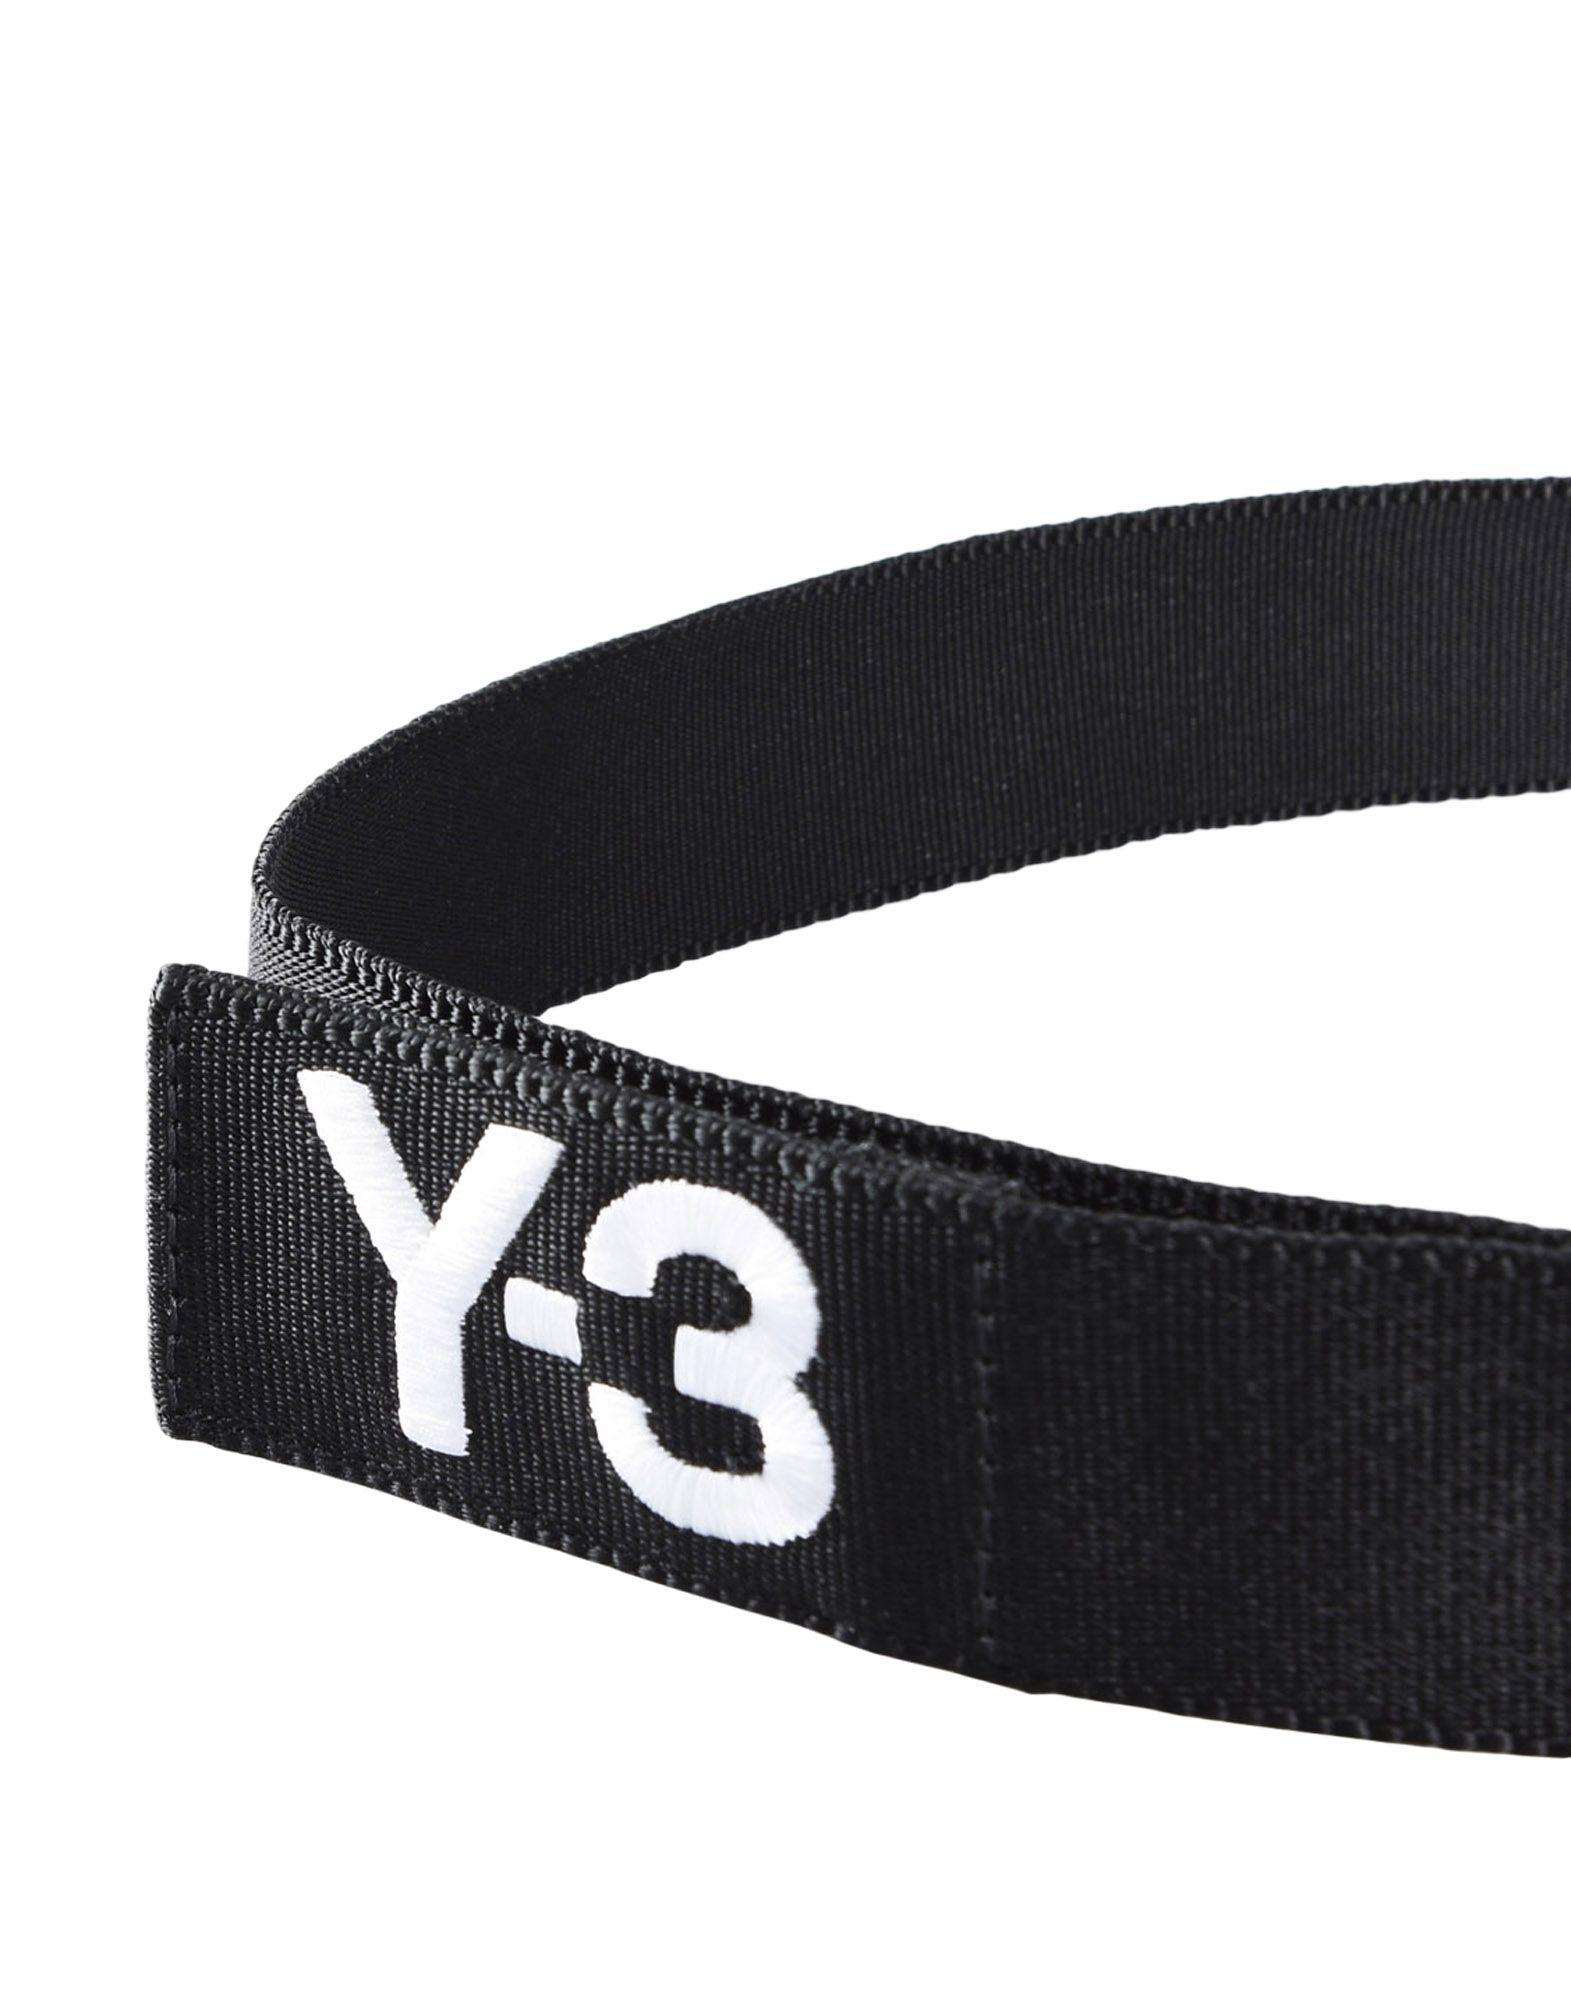 Y-3 LOGO BELT OTHER ACCESSORIES unisex Y-3 adidas